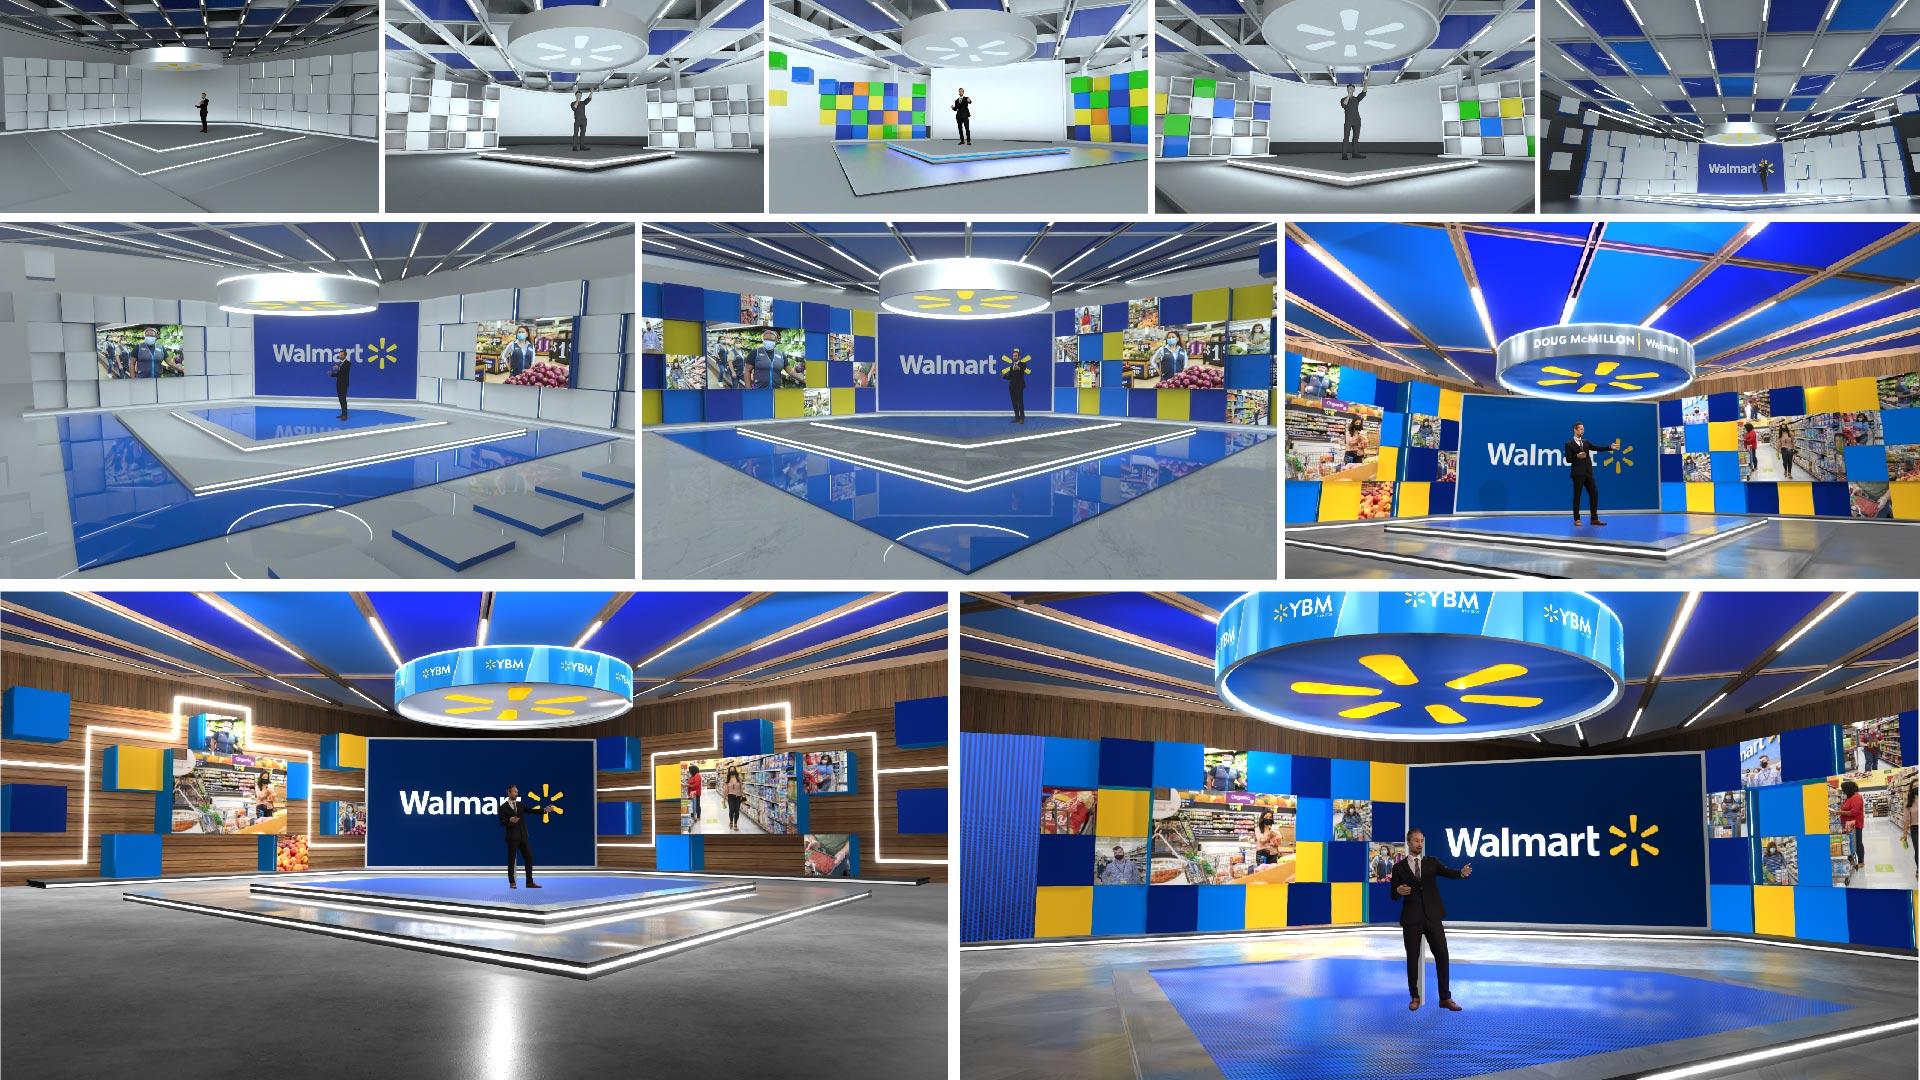 Walmart Corporate Presentations in xR